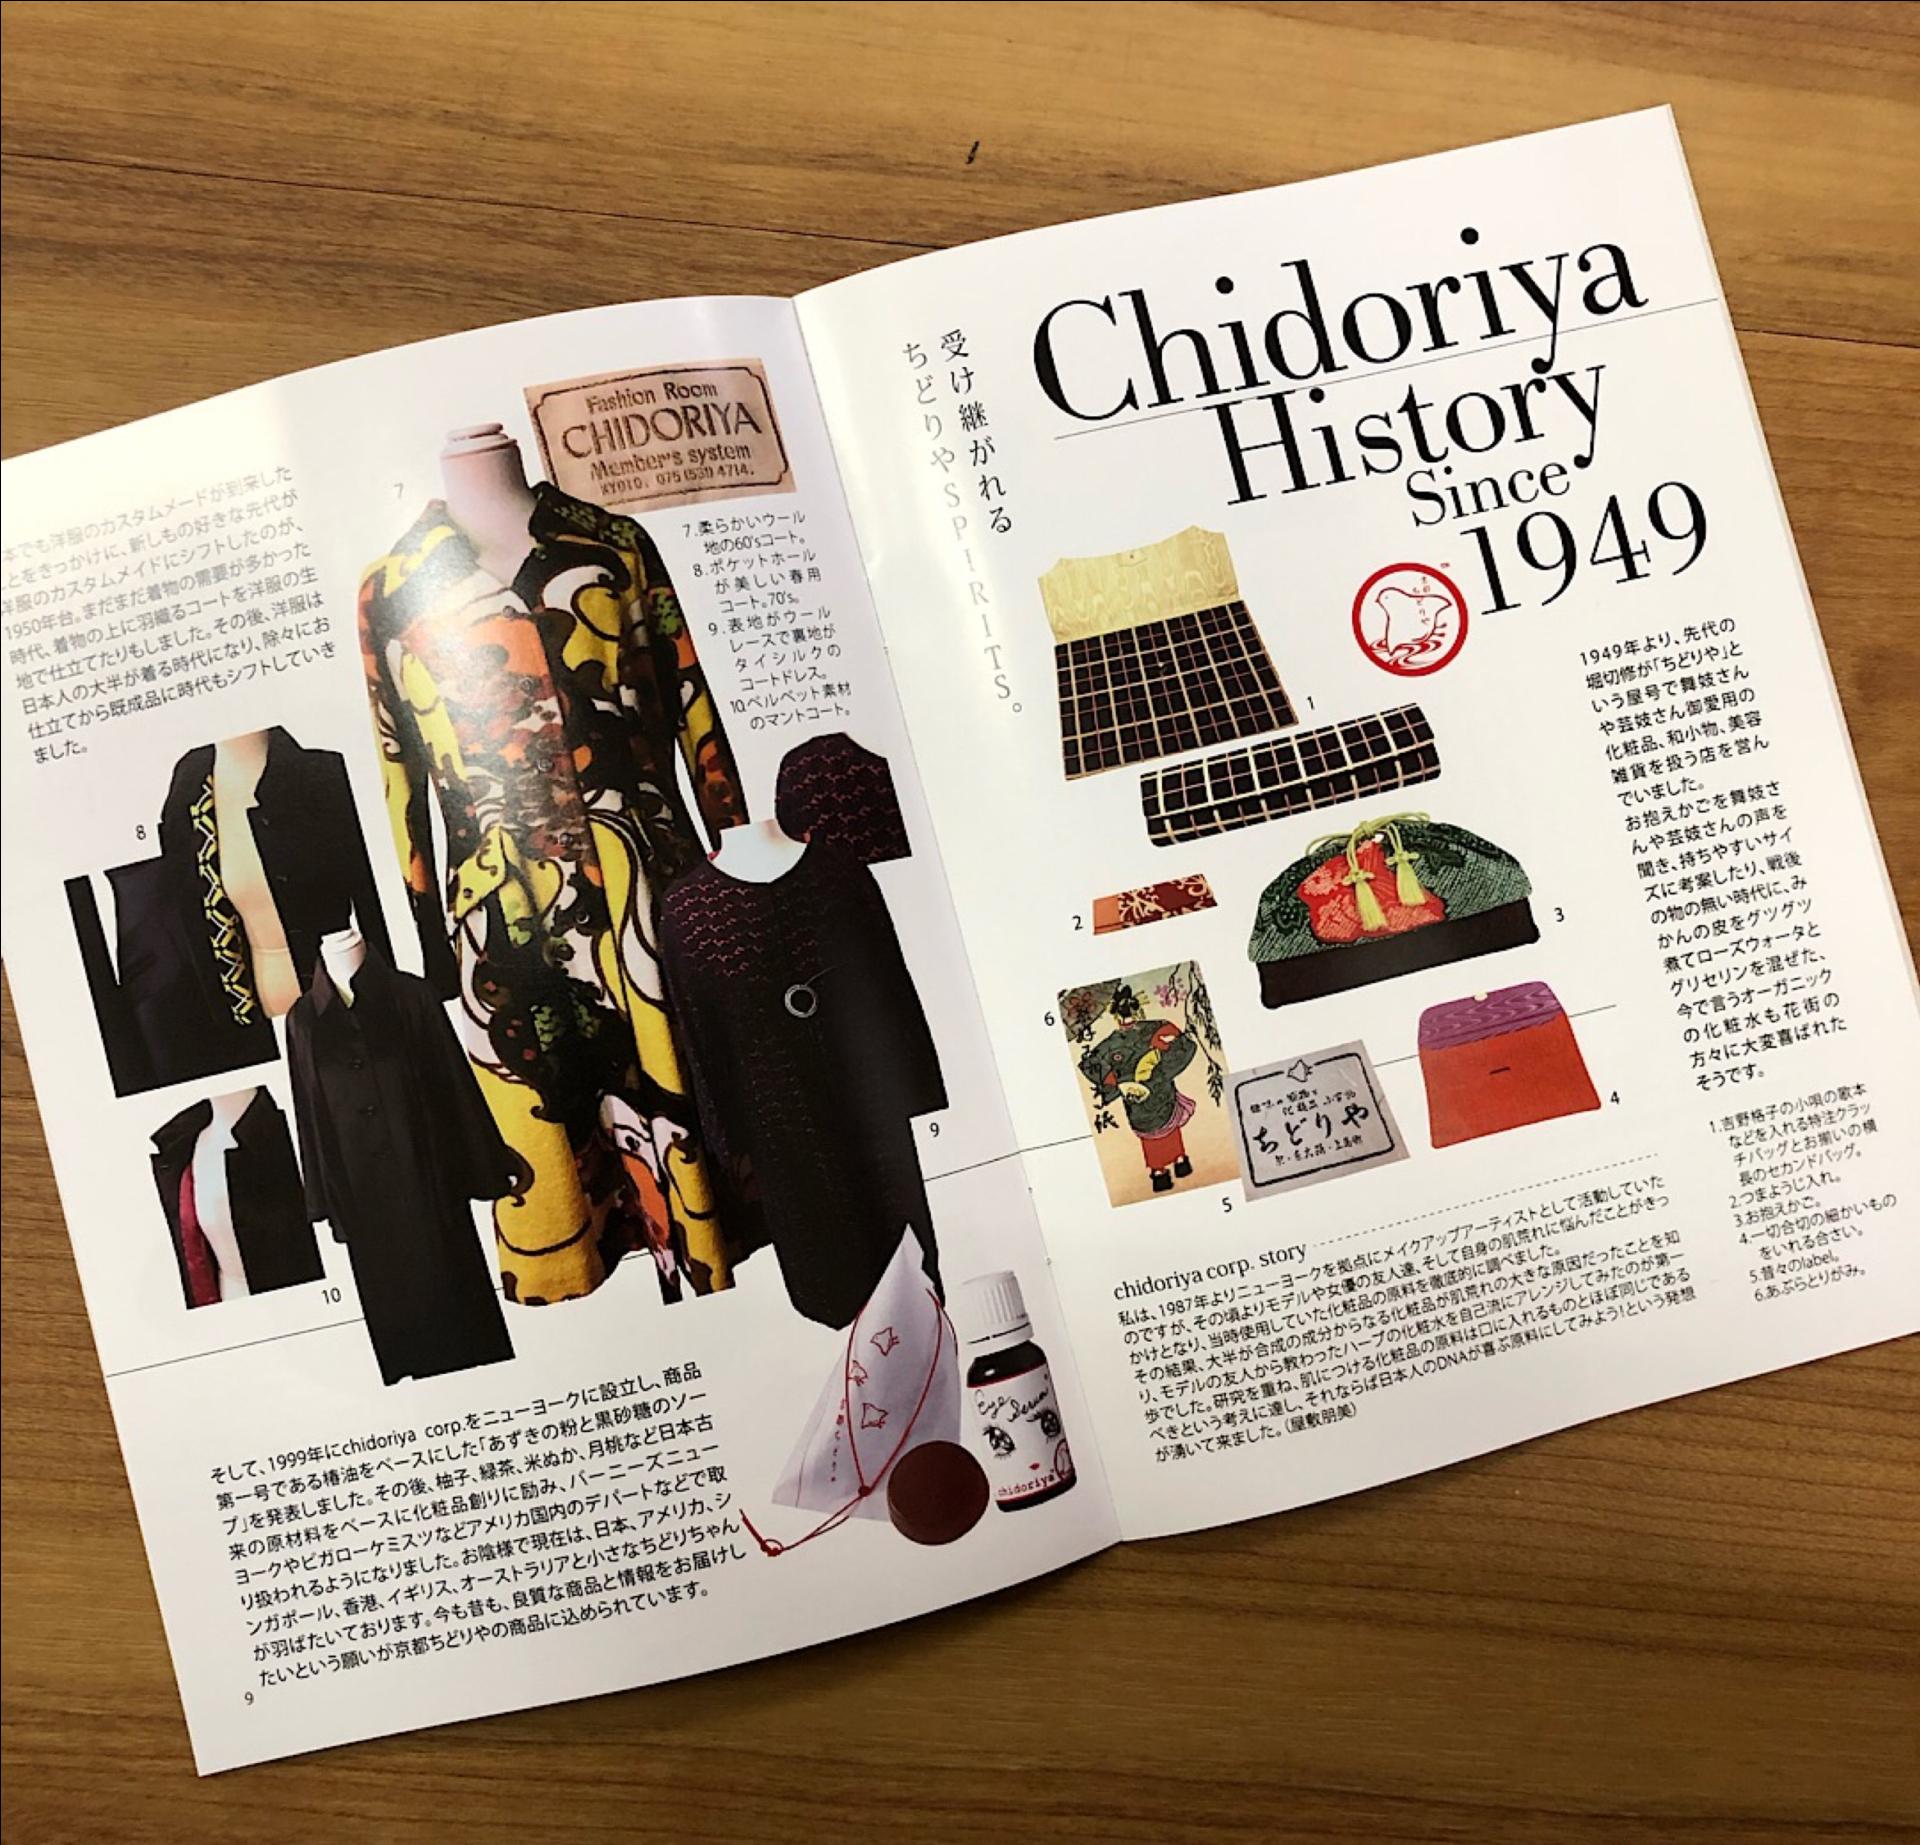 CHIDORIYA ROCKS 69thパンフレットデザイン